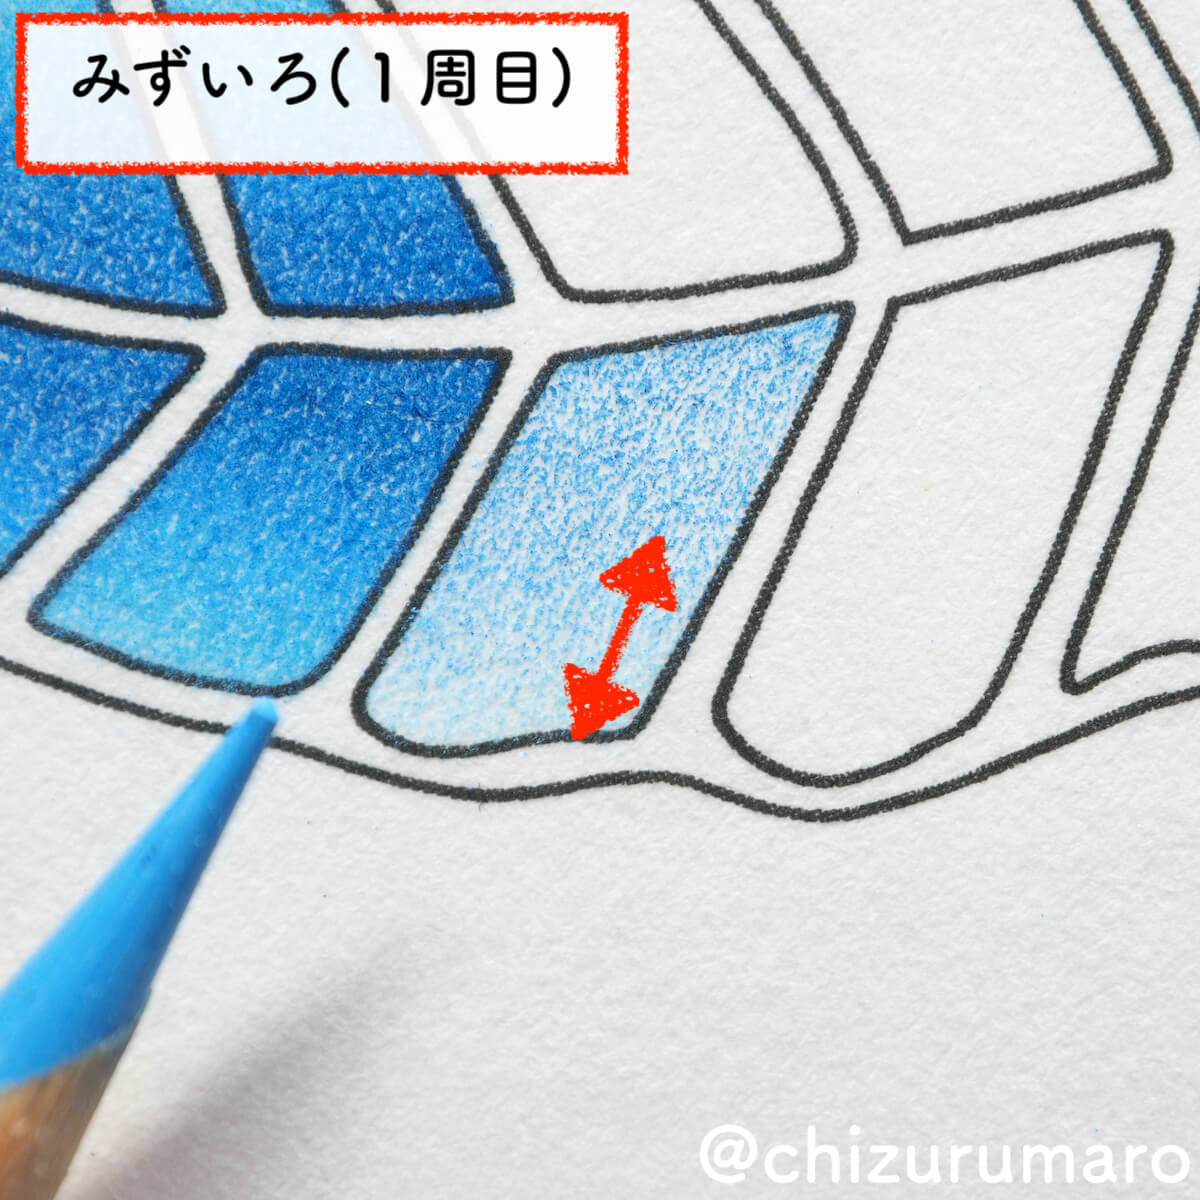 f:id:chizurumaro:20200616104618j:plain